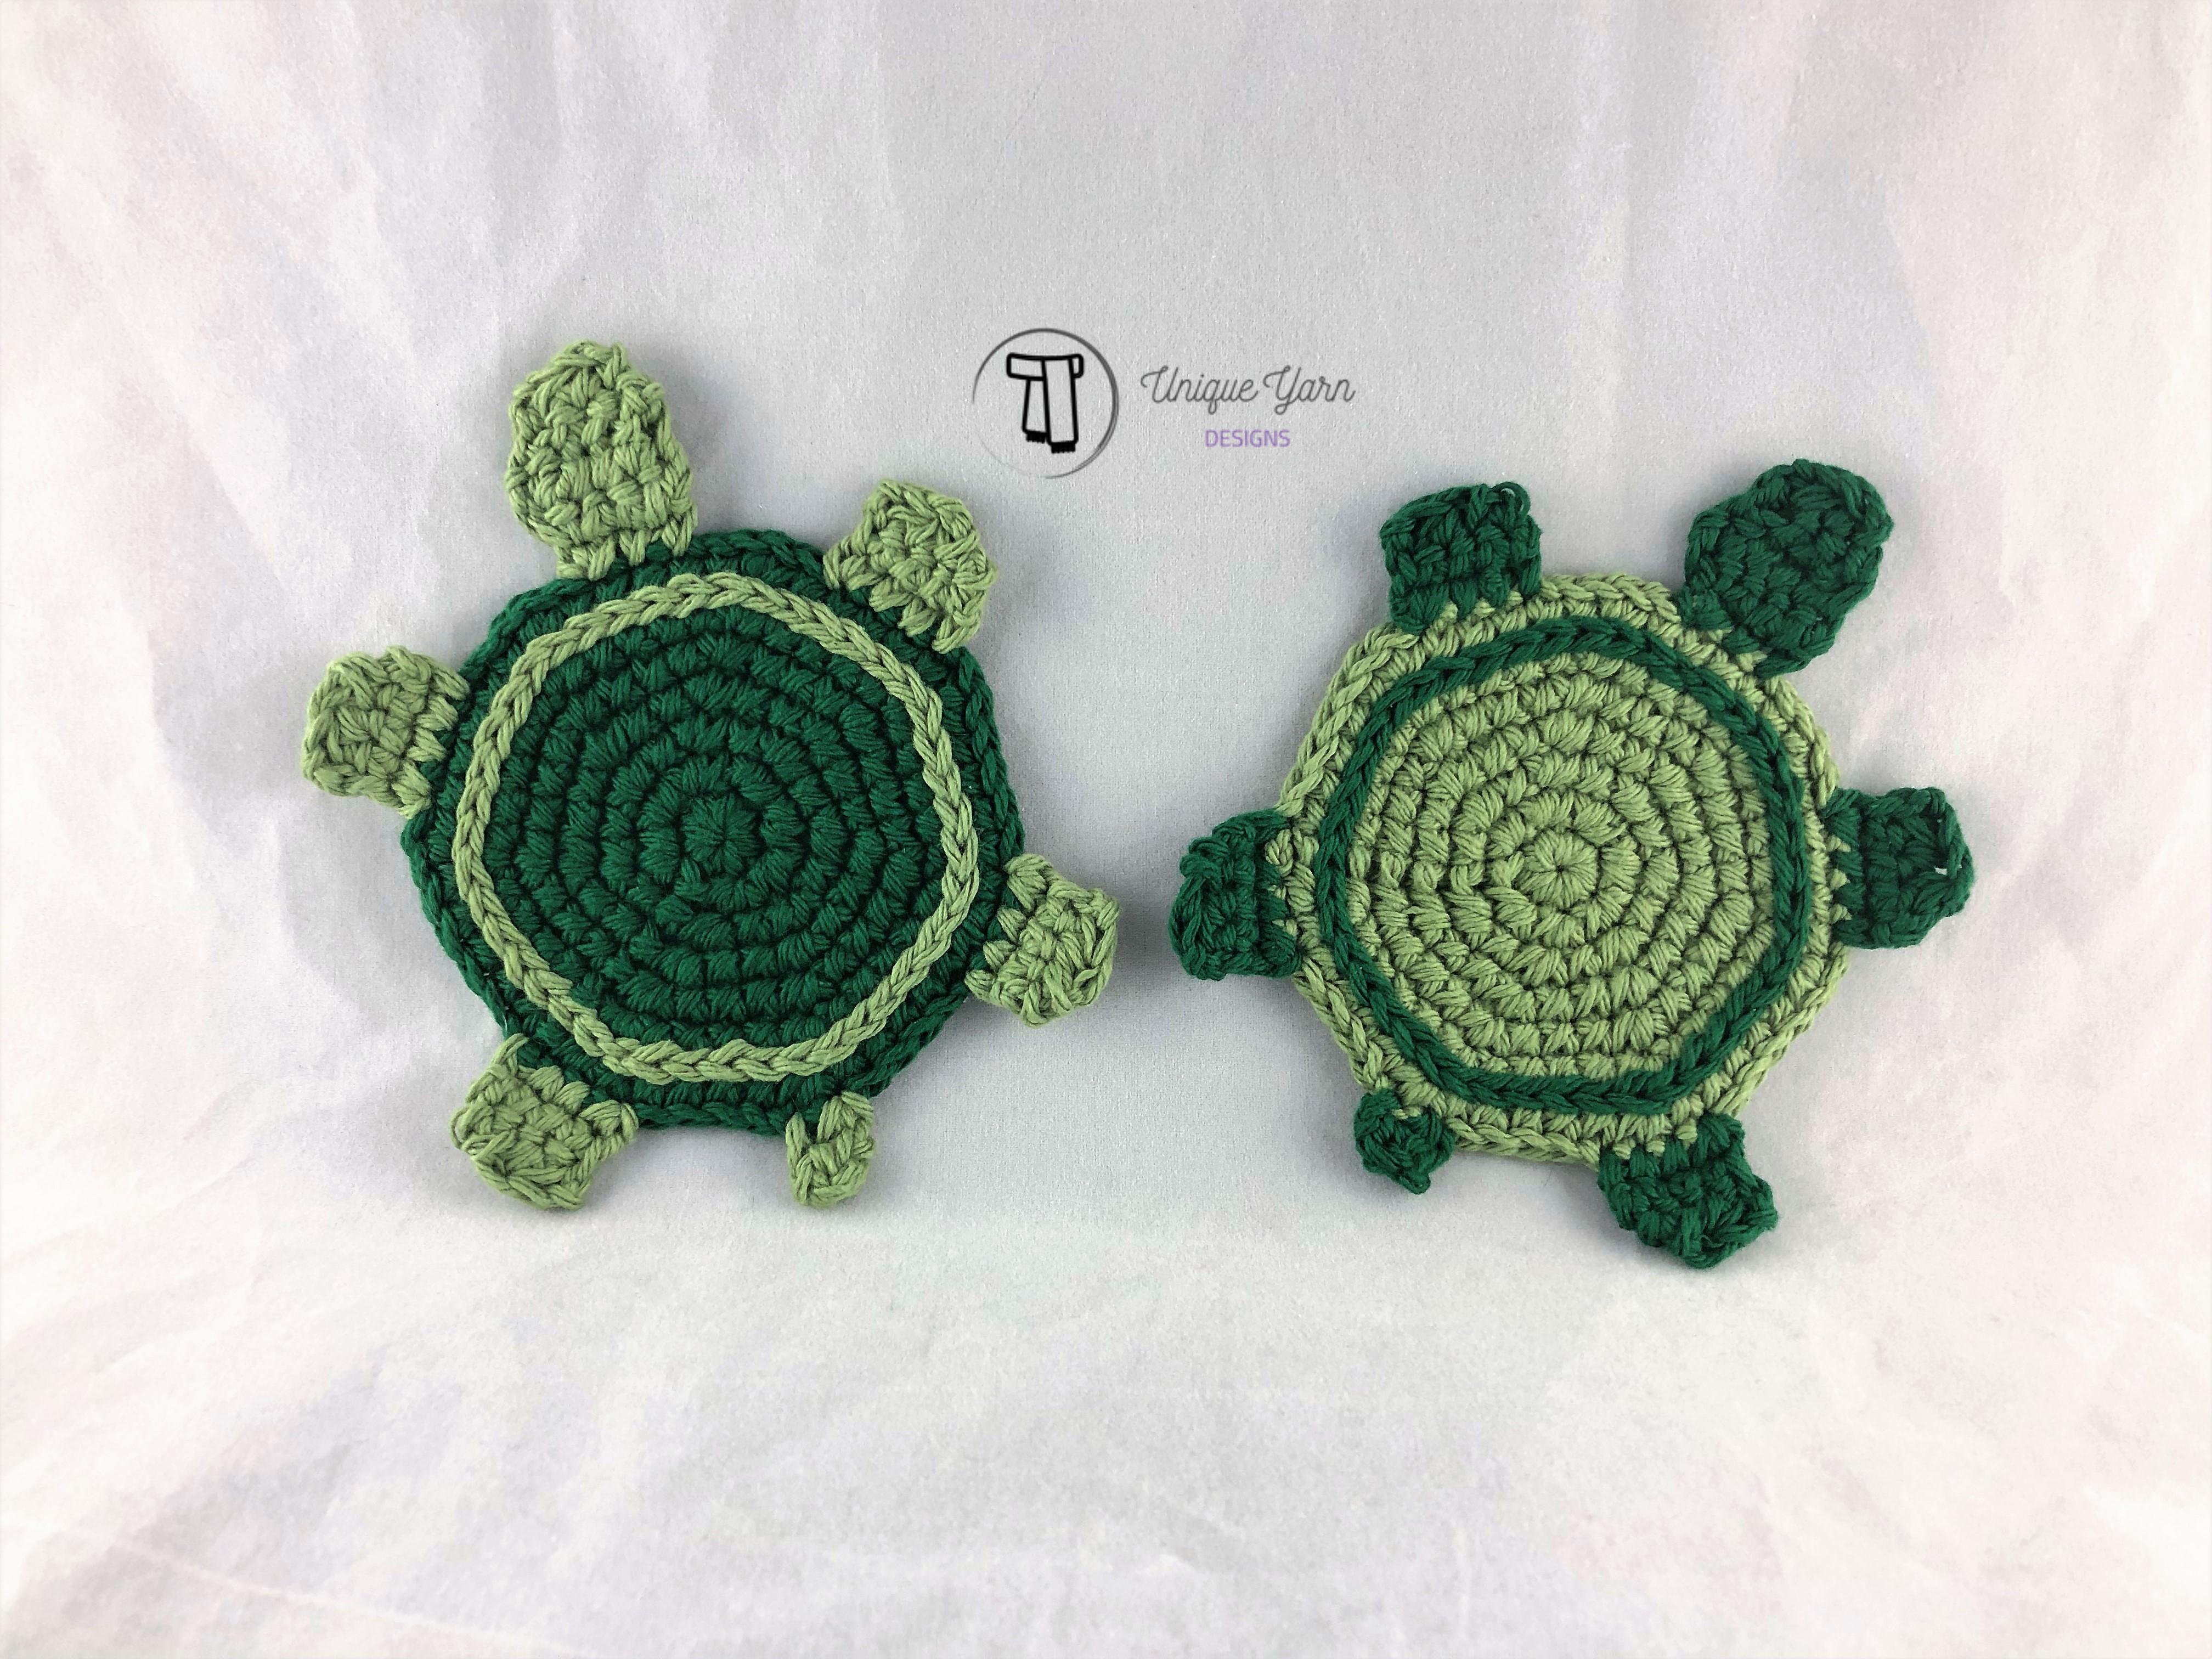 Sea Turtle Amigurumi Free Crochet Pattern | 3024x4032